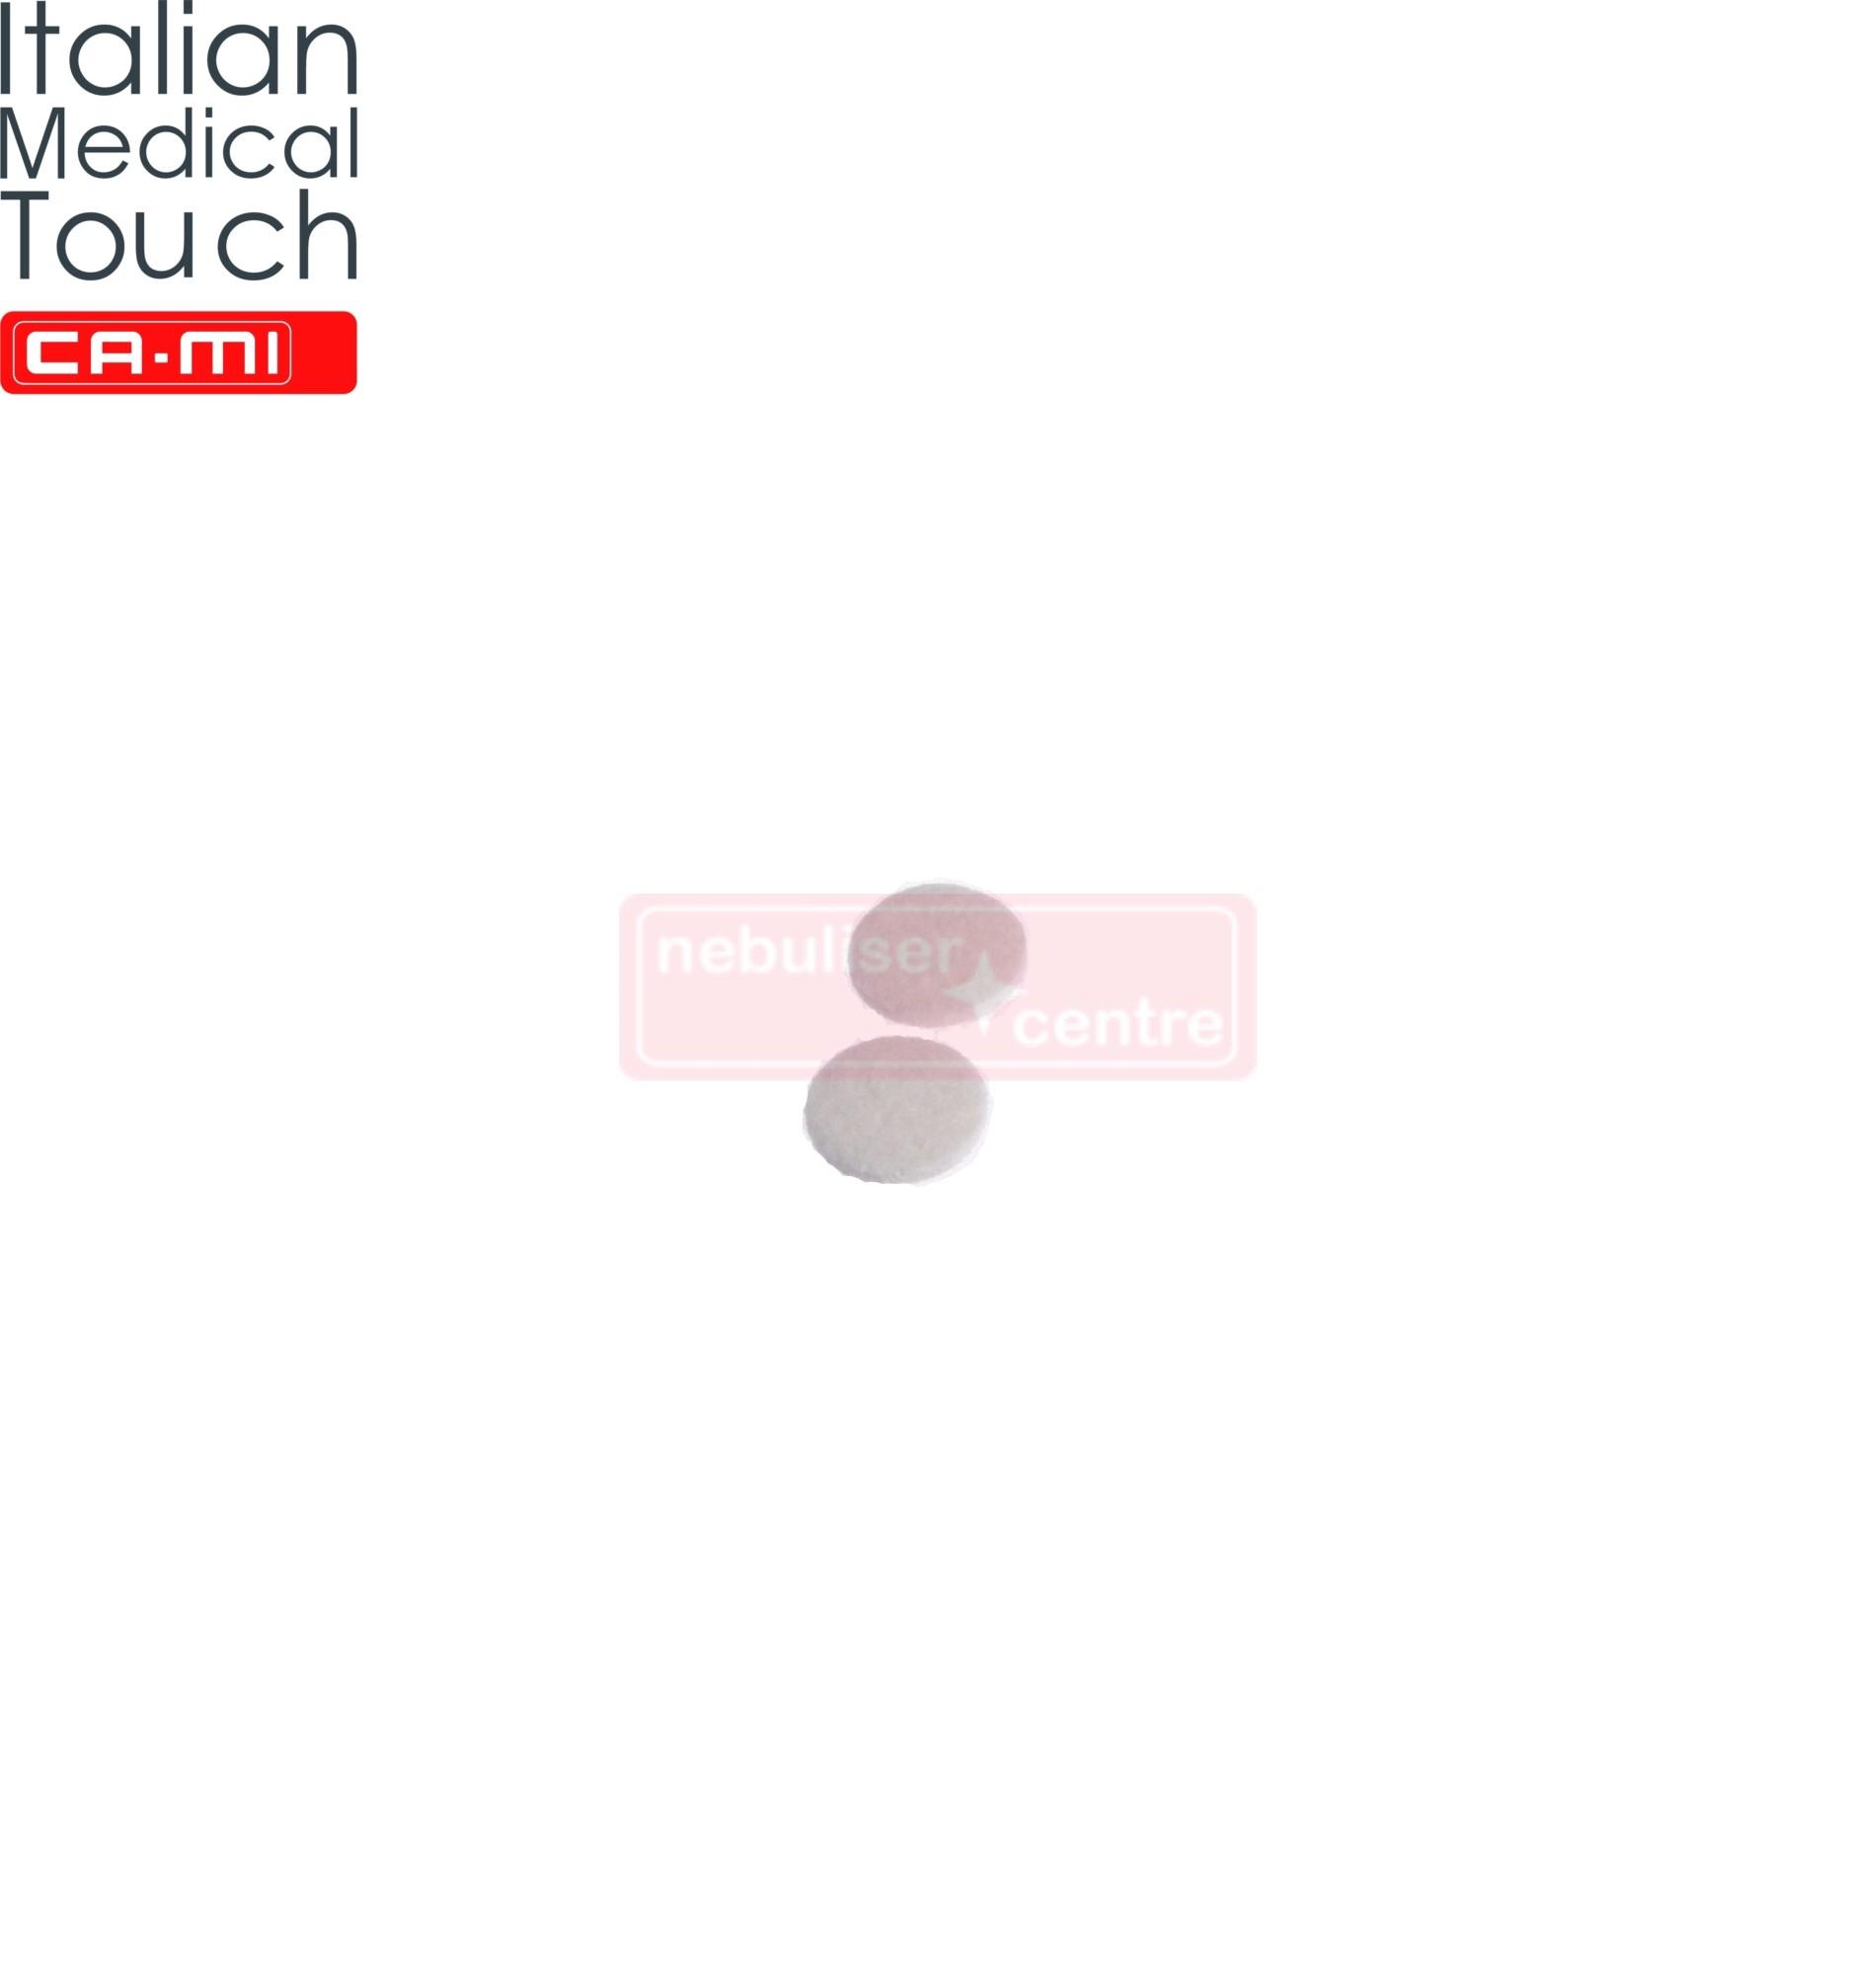 Nebulizer filter for CA-MI Speedymed nebuliser